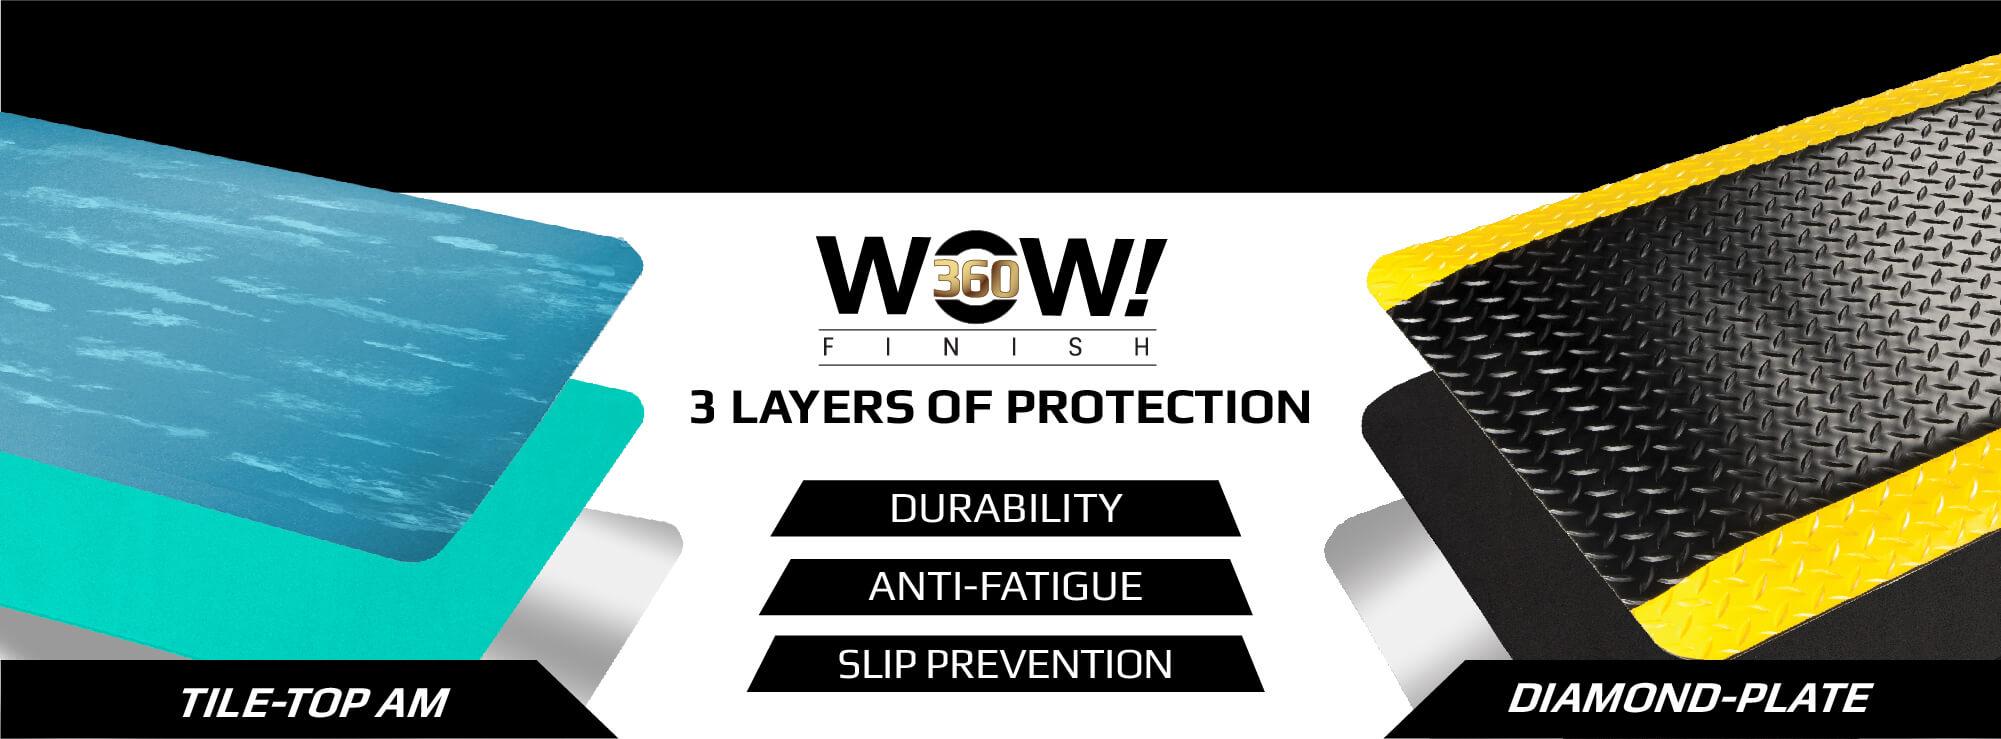 The Gold Standard of Safety & Ergonomics